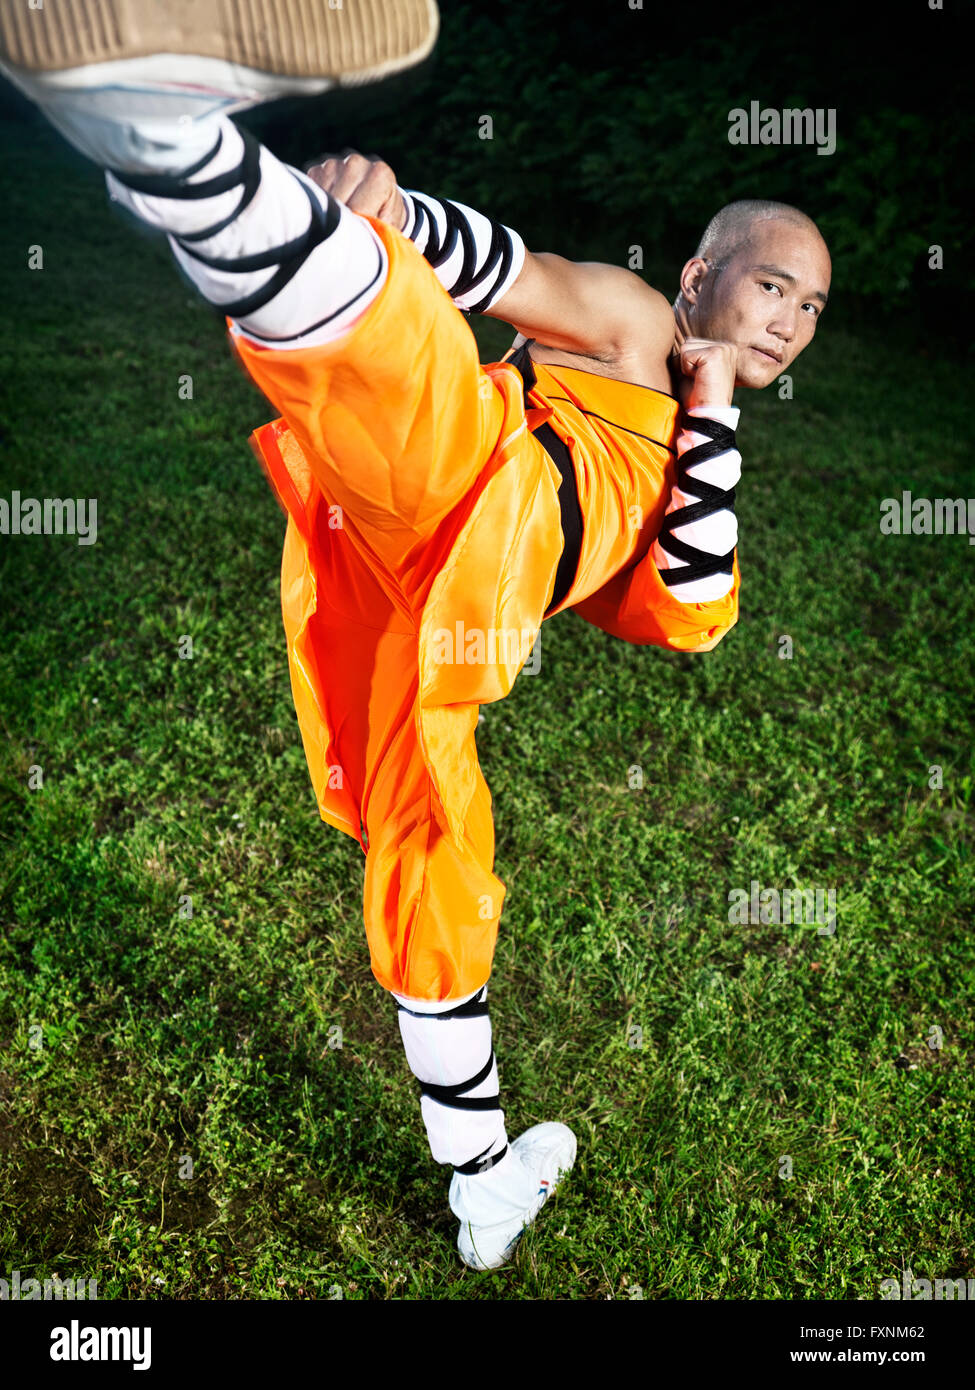 Shaolin Krieger Mönch Chuai Tui Seite Kick zu tun Stockbild